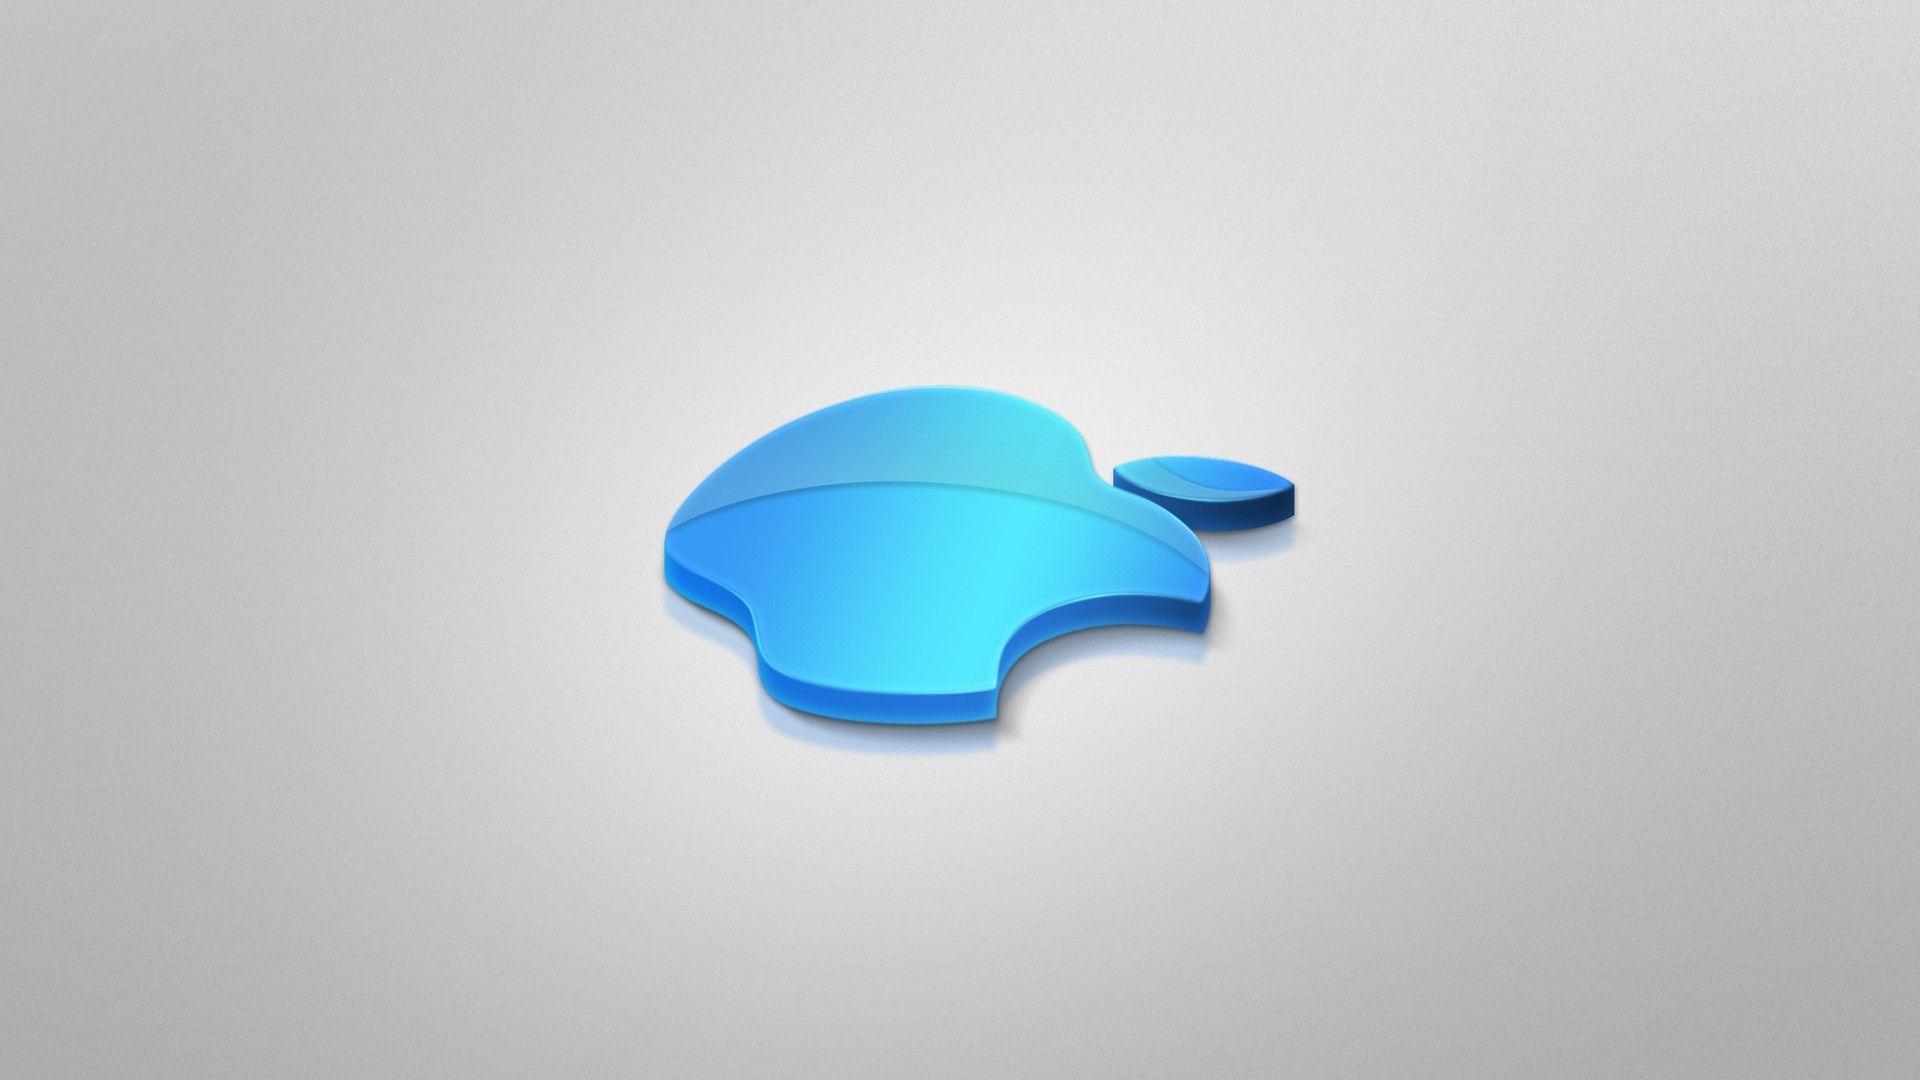 Apple Wallpapers HD 1080p - Wallpaper Cave